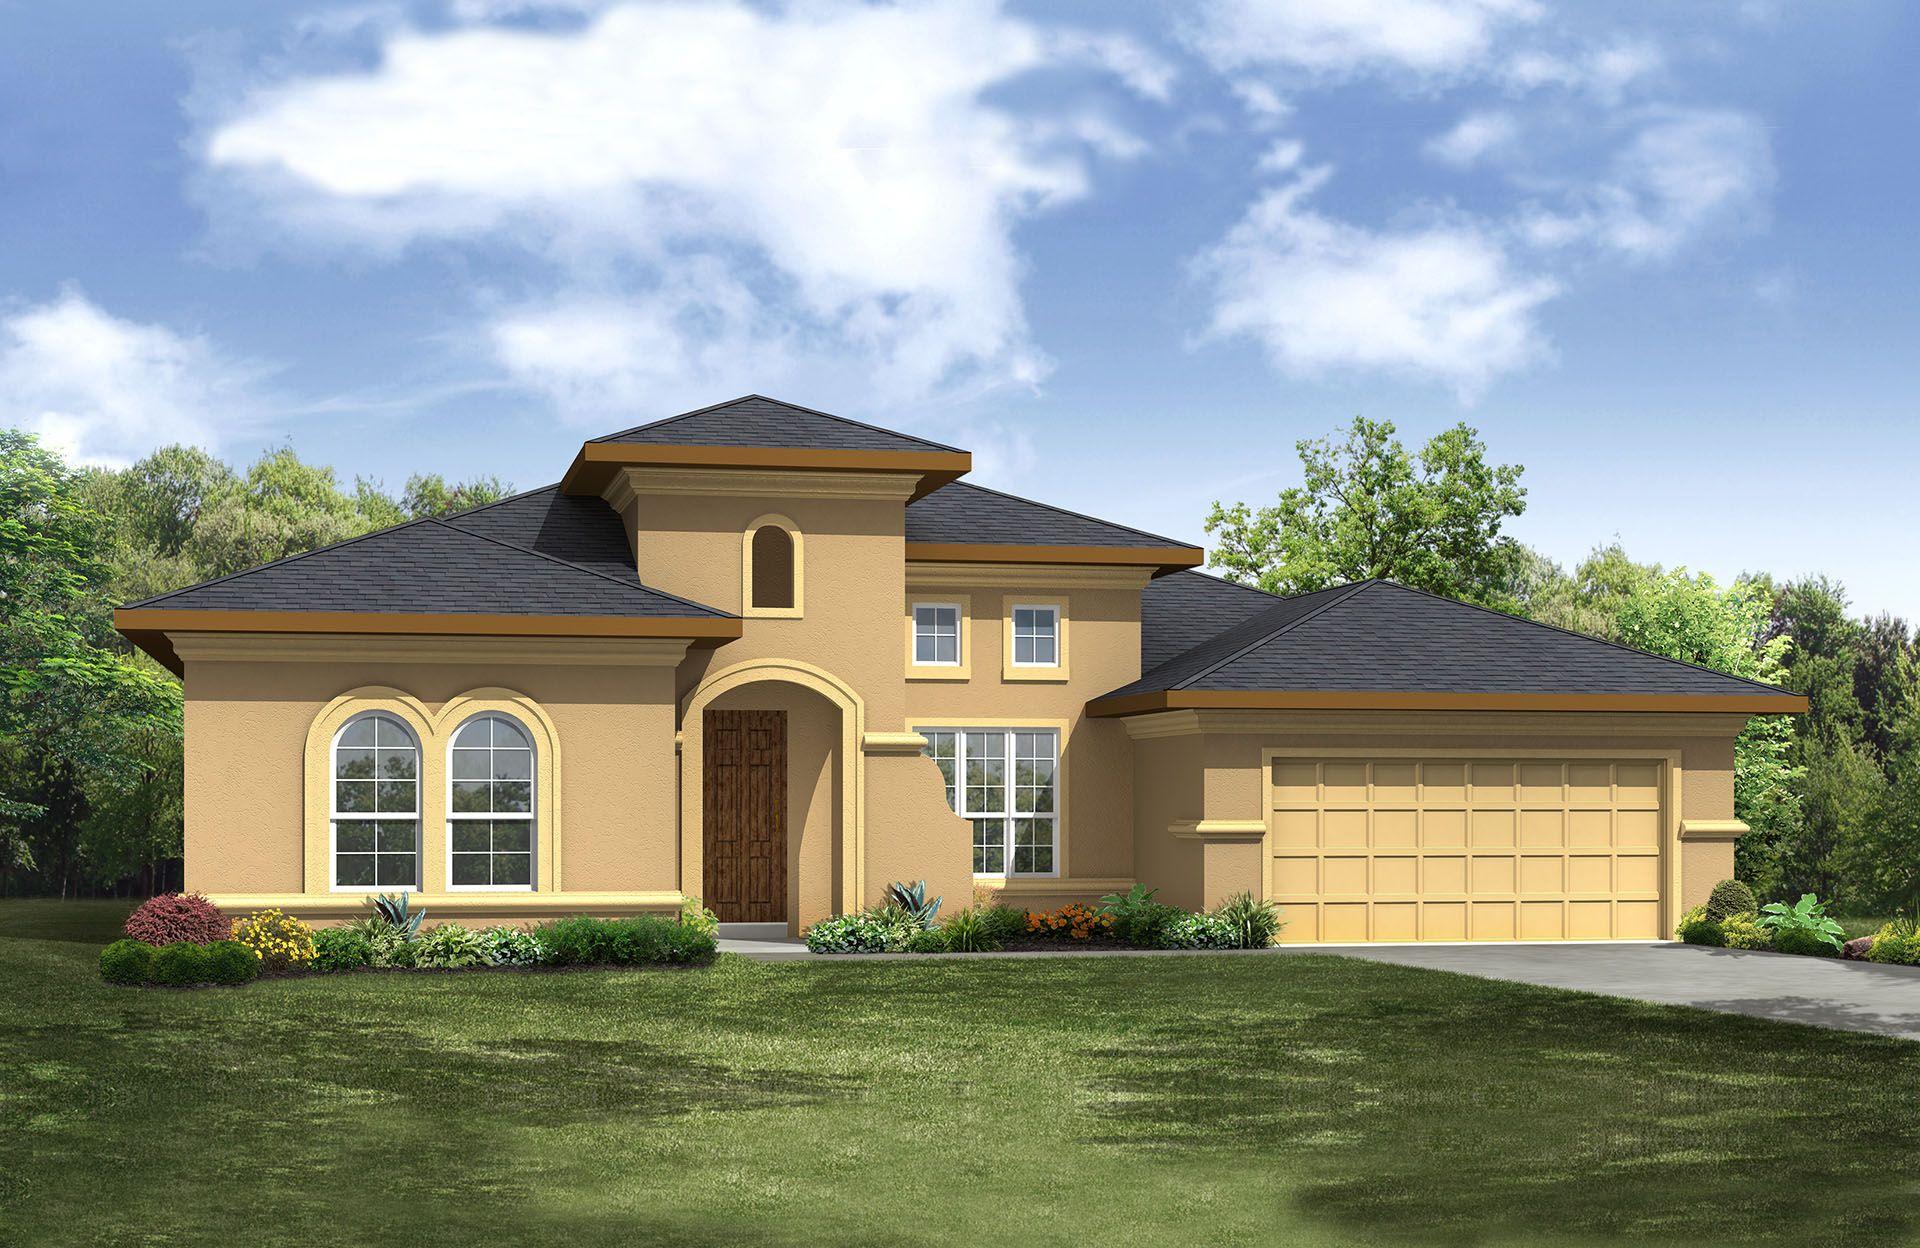 Single Family for Sale at Cimarron Hills - Taylor Ii 307 Flint Ridge Trail Georgetown, Texas 78628 United States